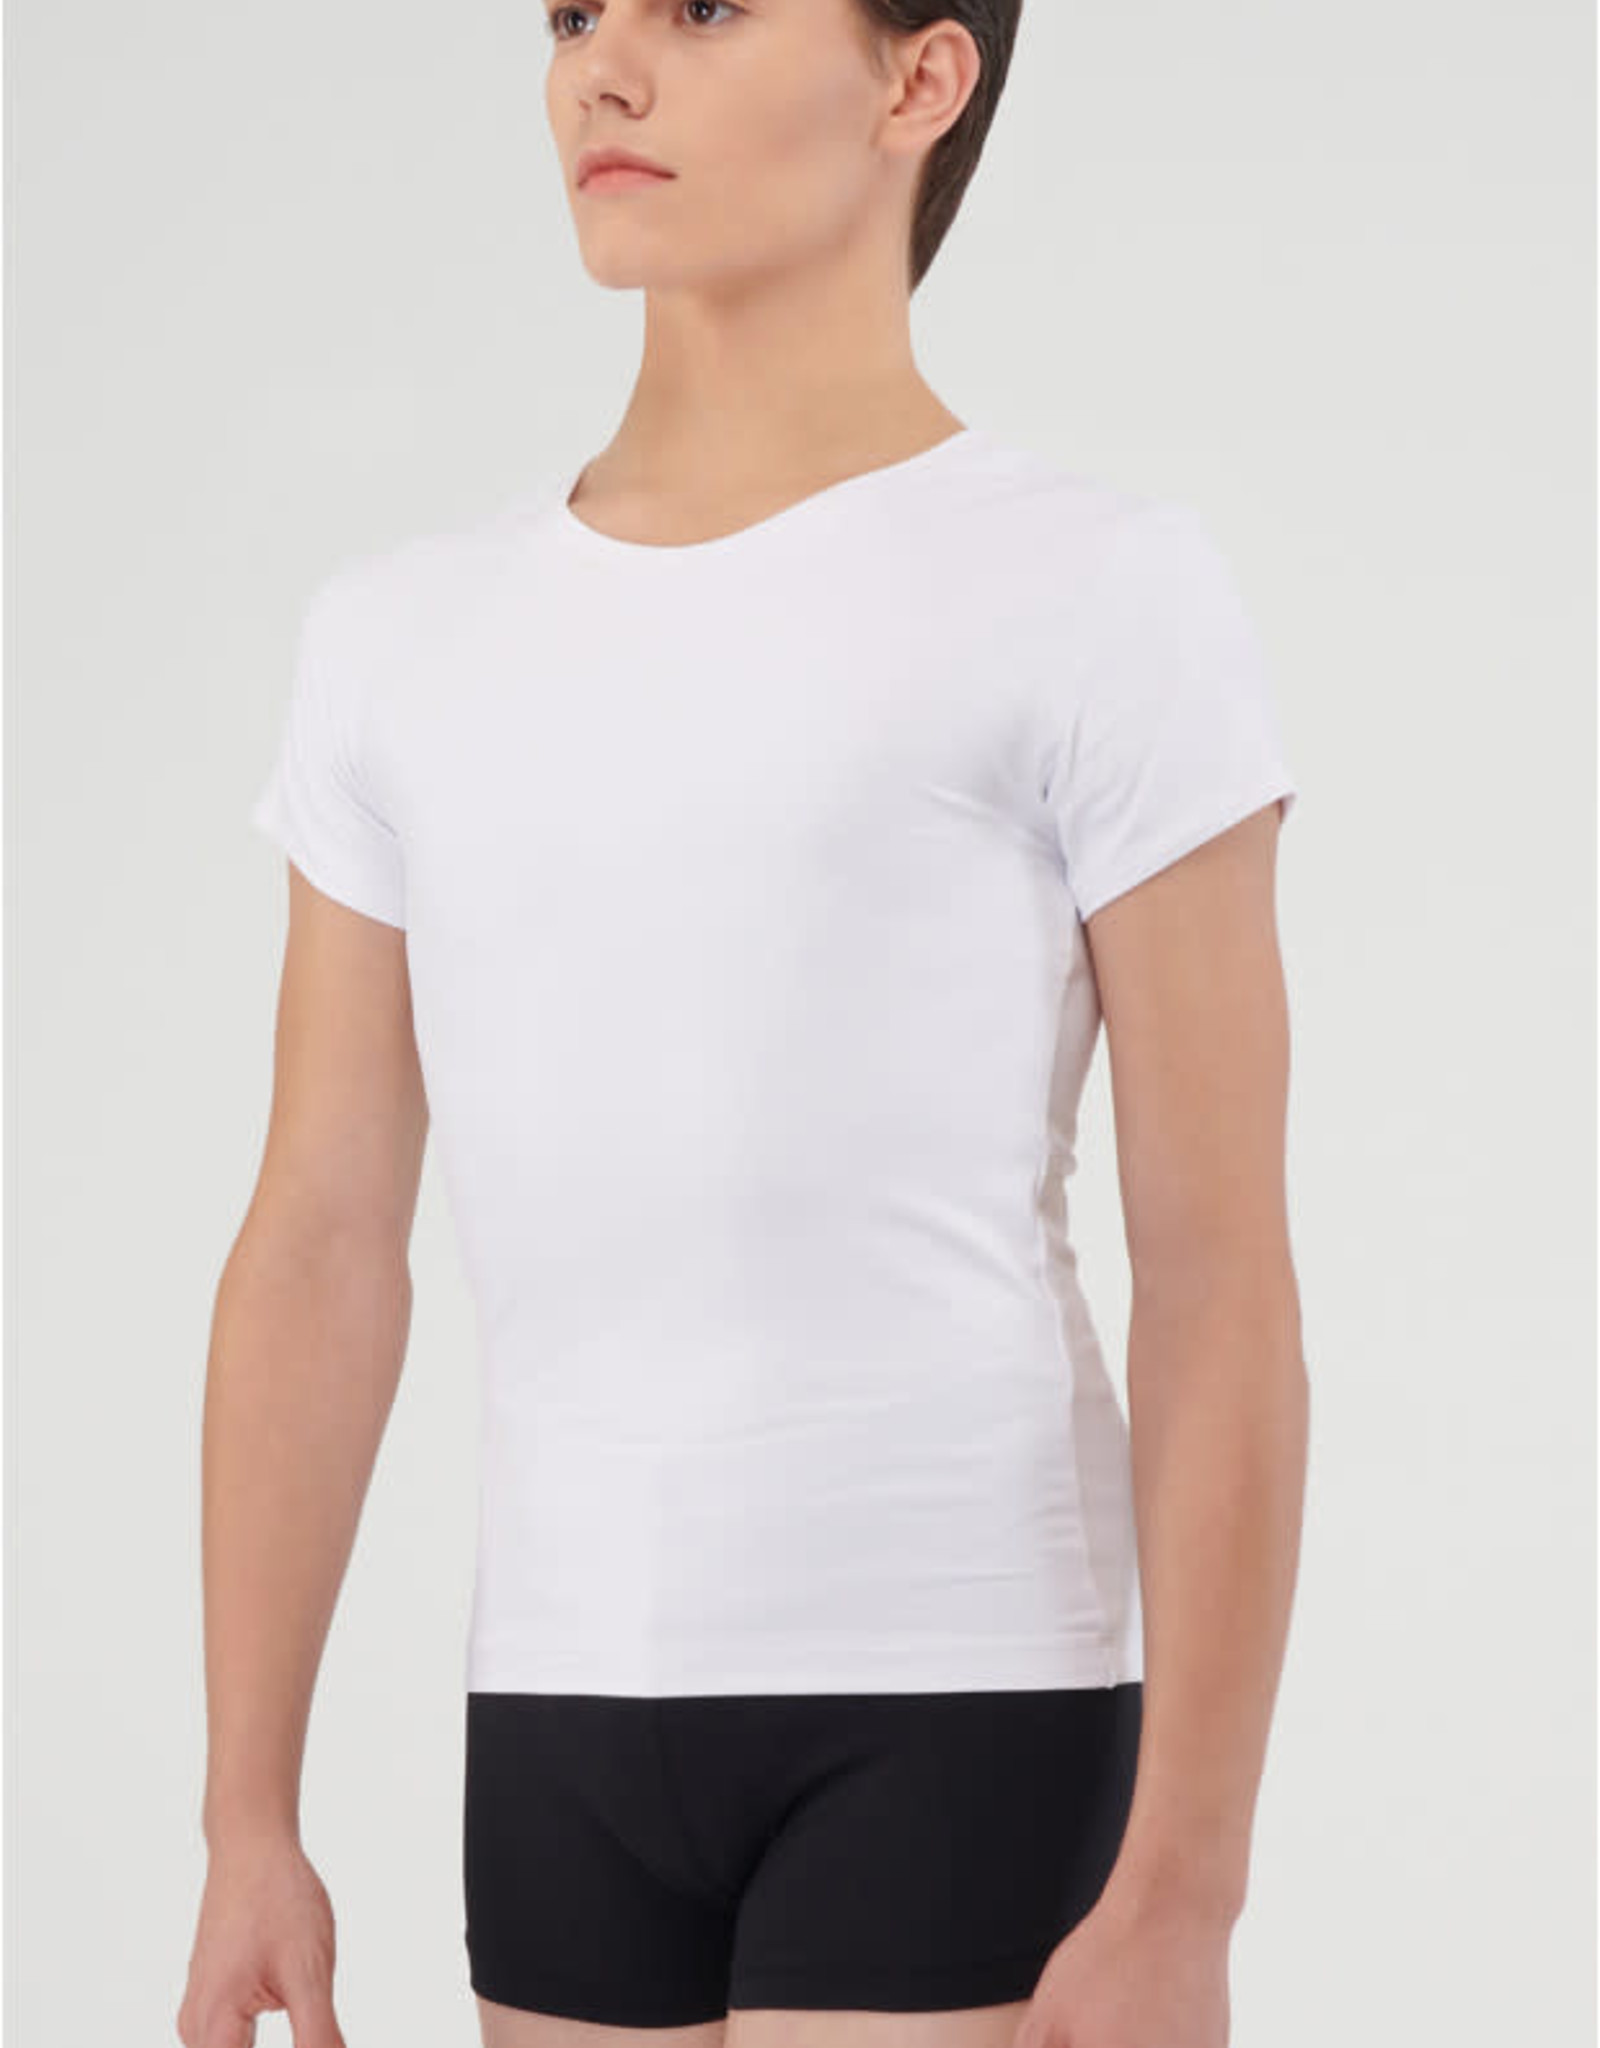 Wear Moi Wear Moi Conrad White T-shirt